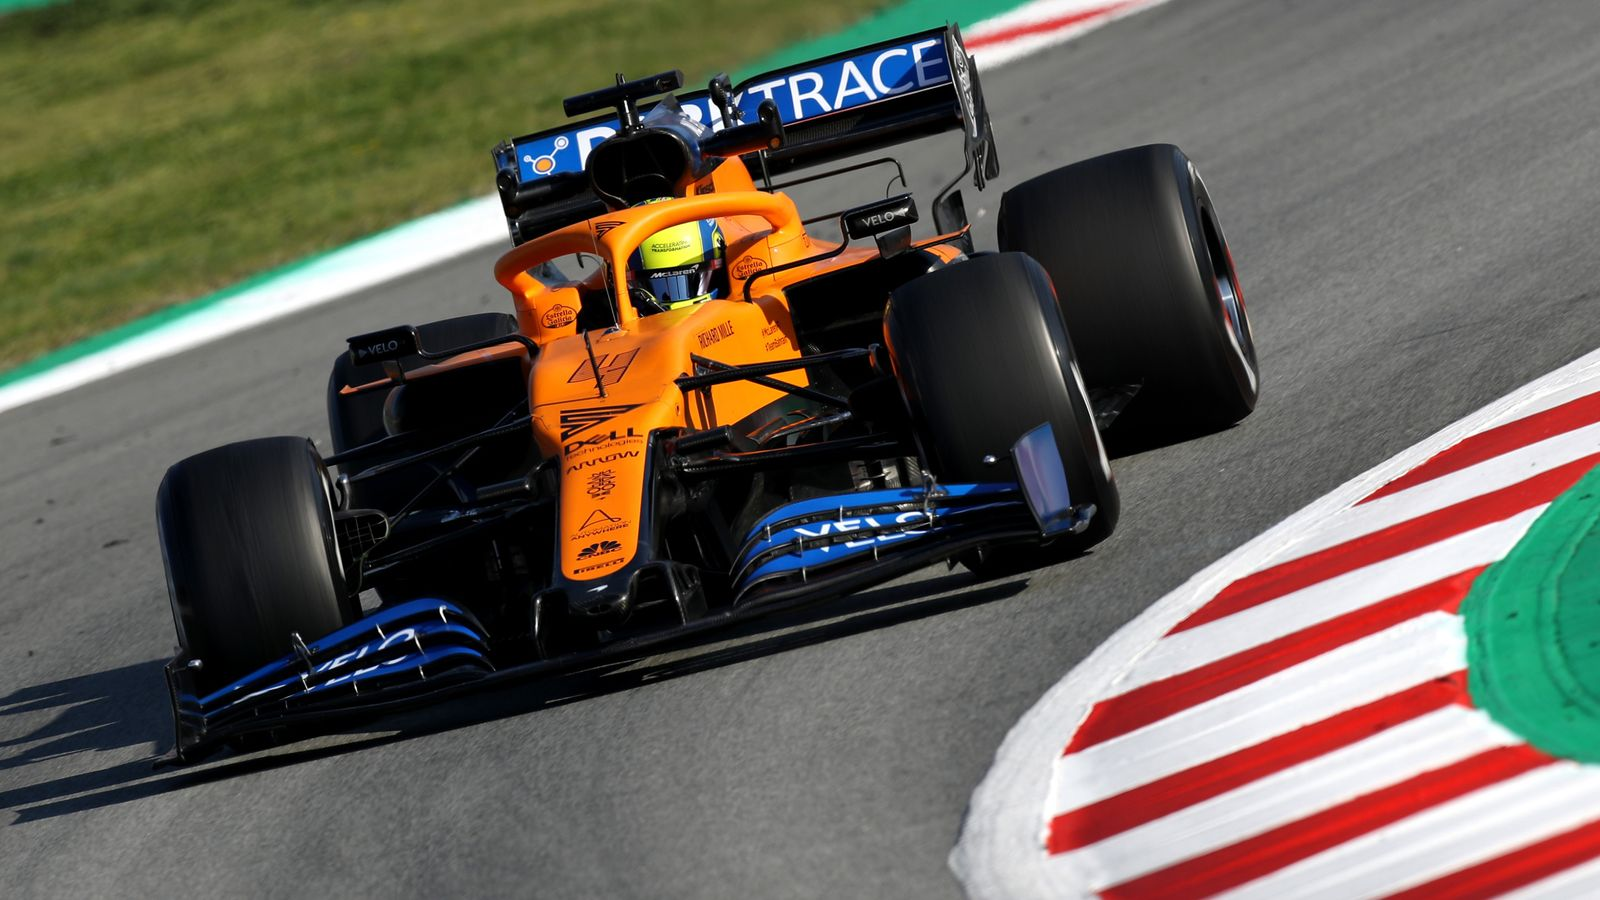 Coronavirus: McLaren weighs sale of stake in Formula One team | Business News